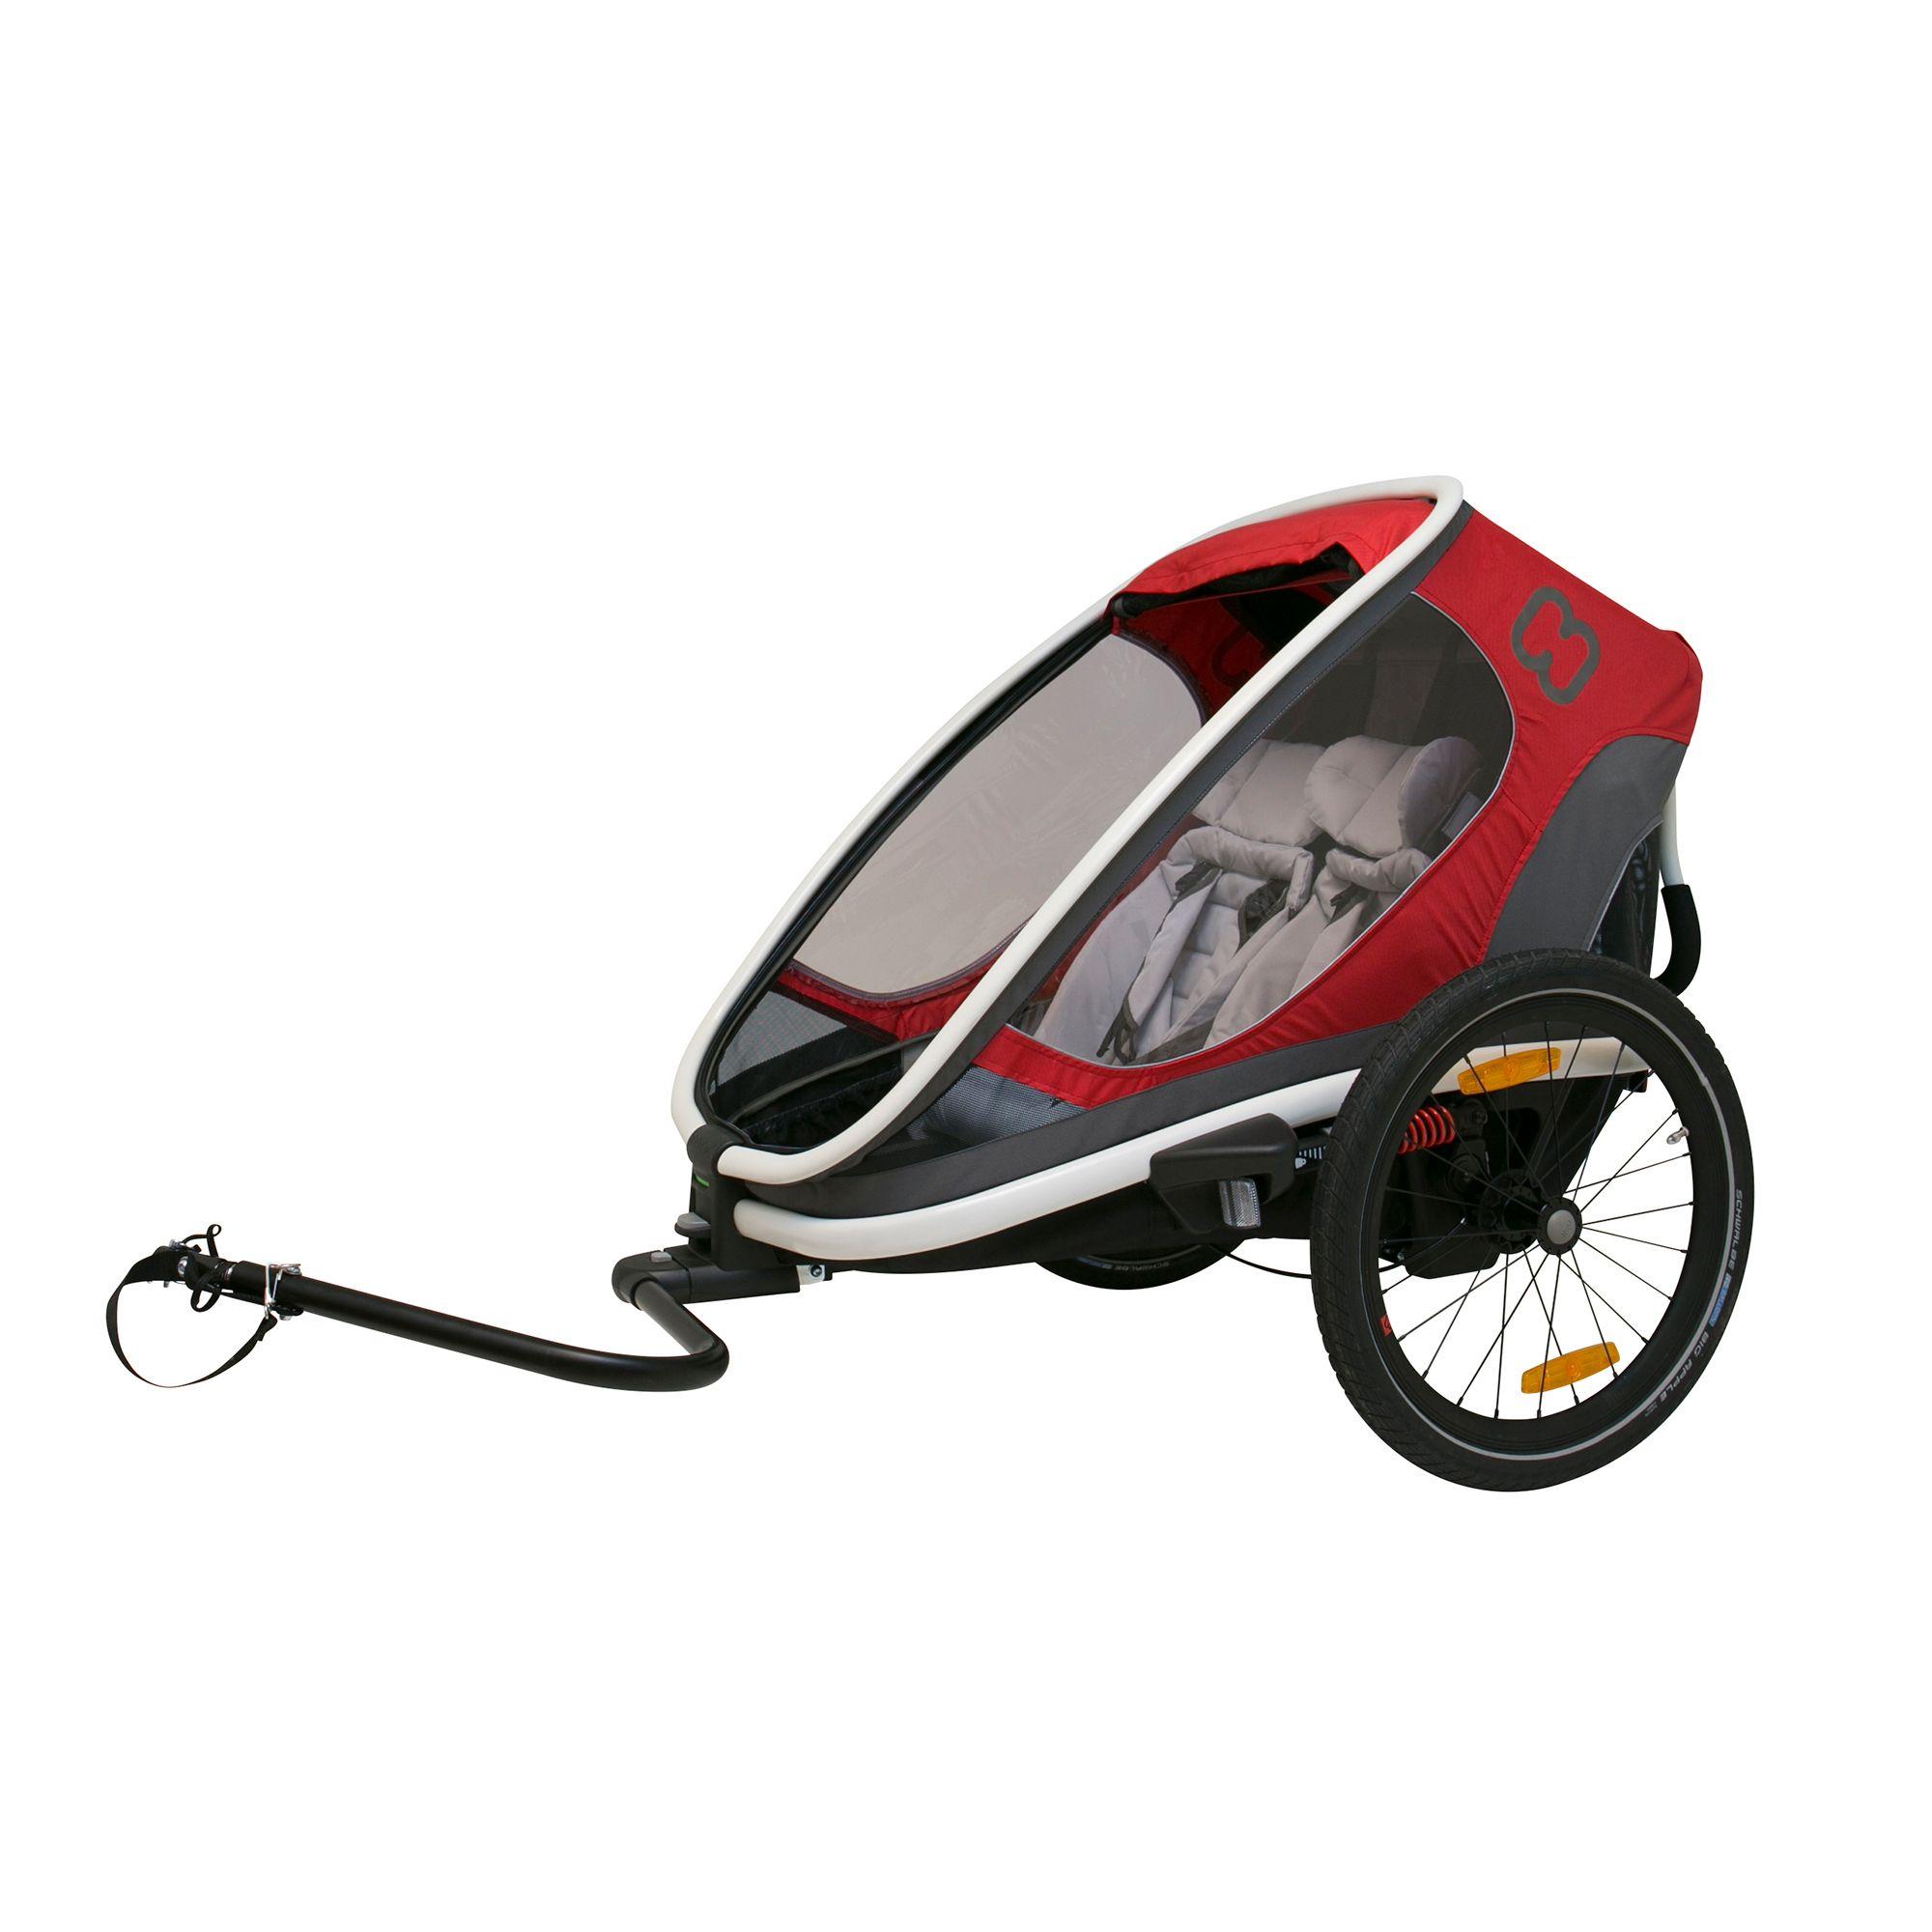 Hamax Outback MultiSport Child Bike Trailer Stroller